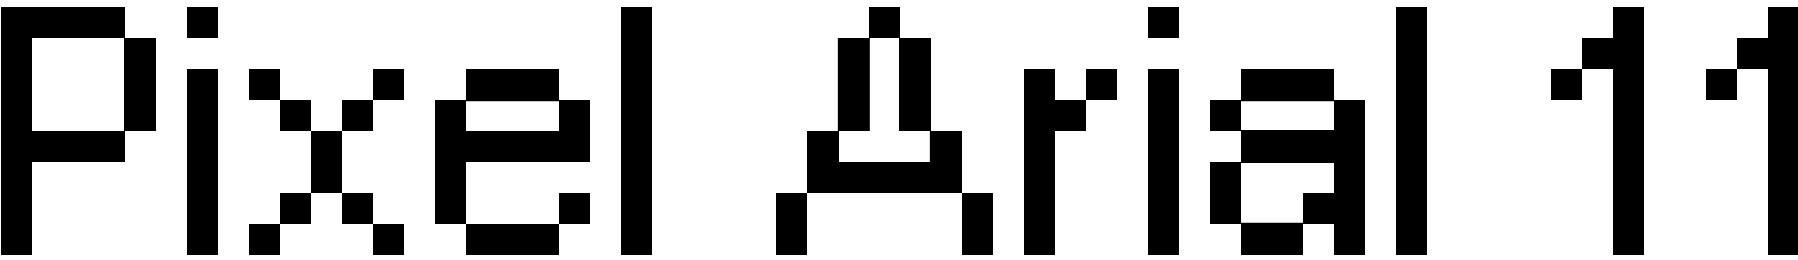 Pixel Arial 11